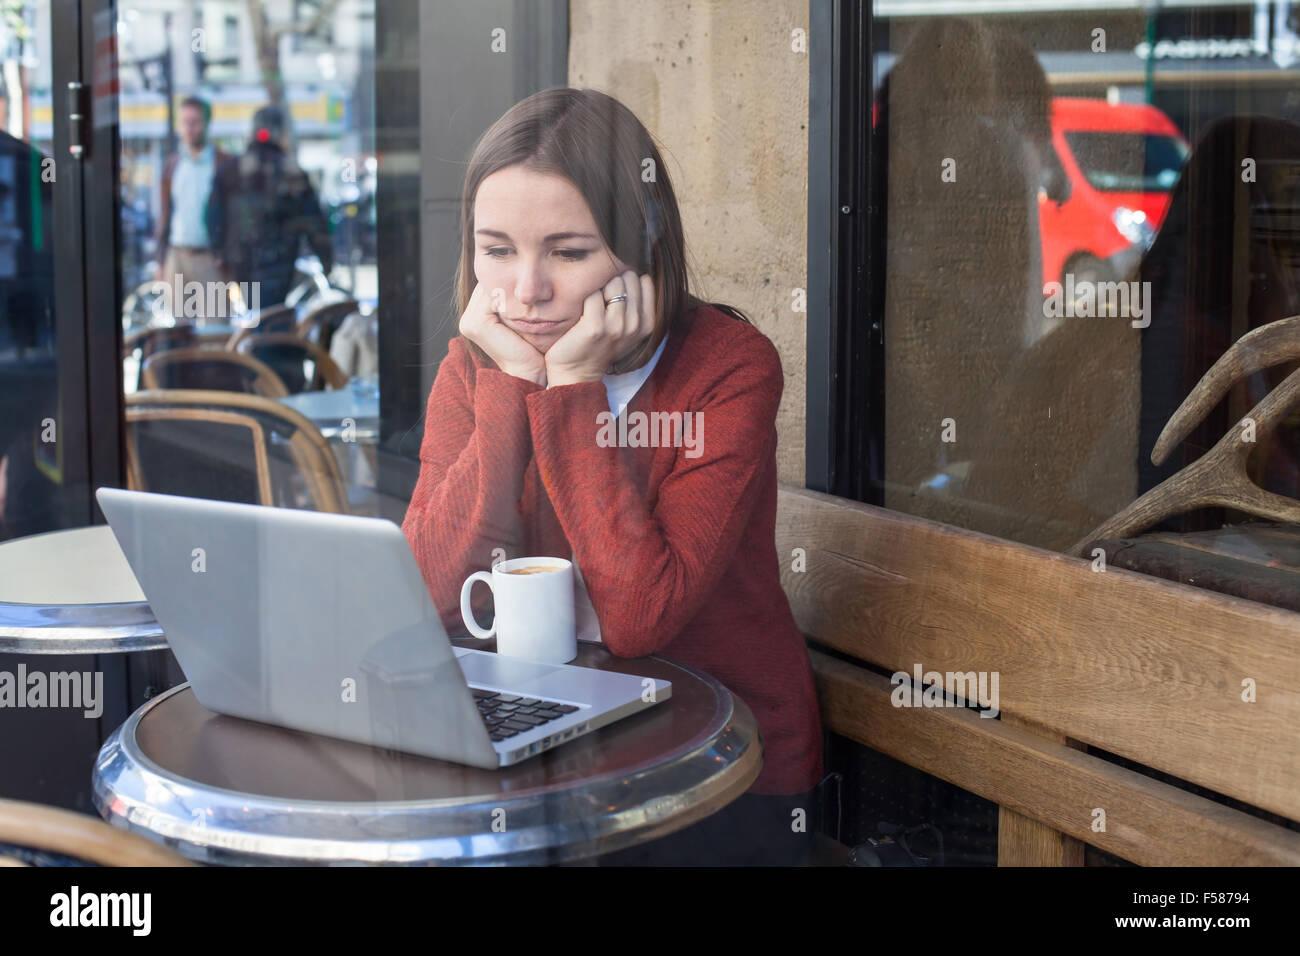 Concepto de envidia, aburrido triste mujer en frente del ordenador Imagen De Stock